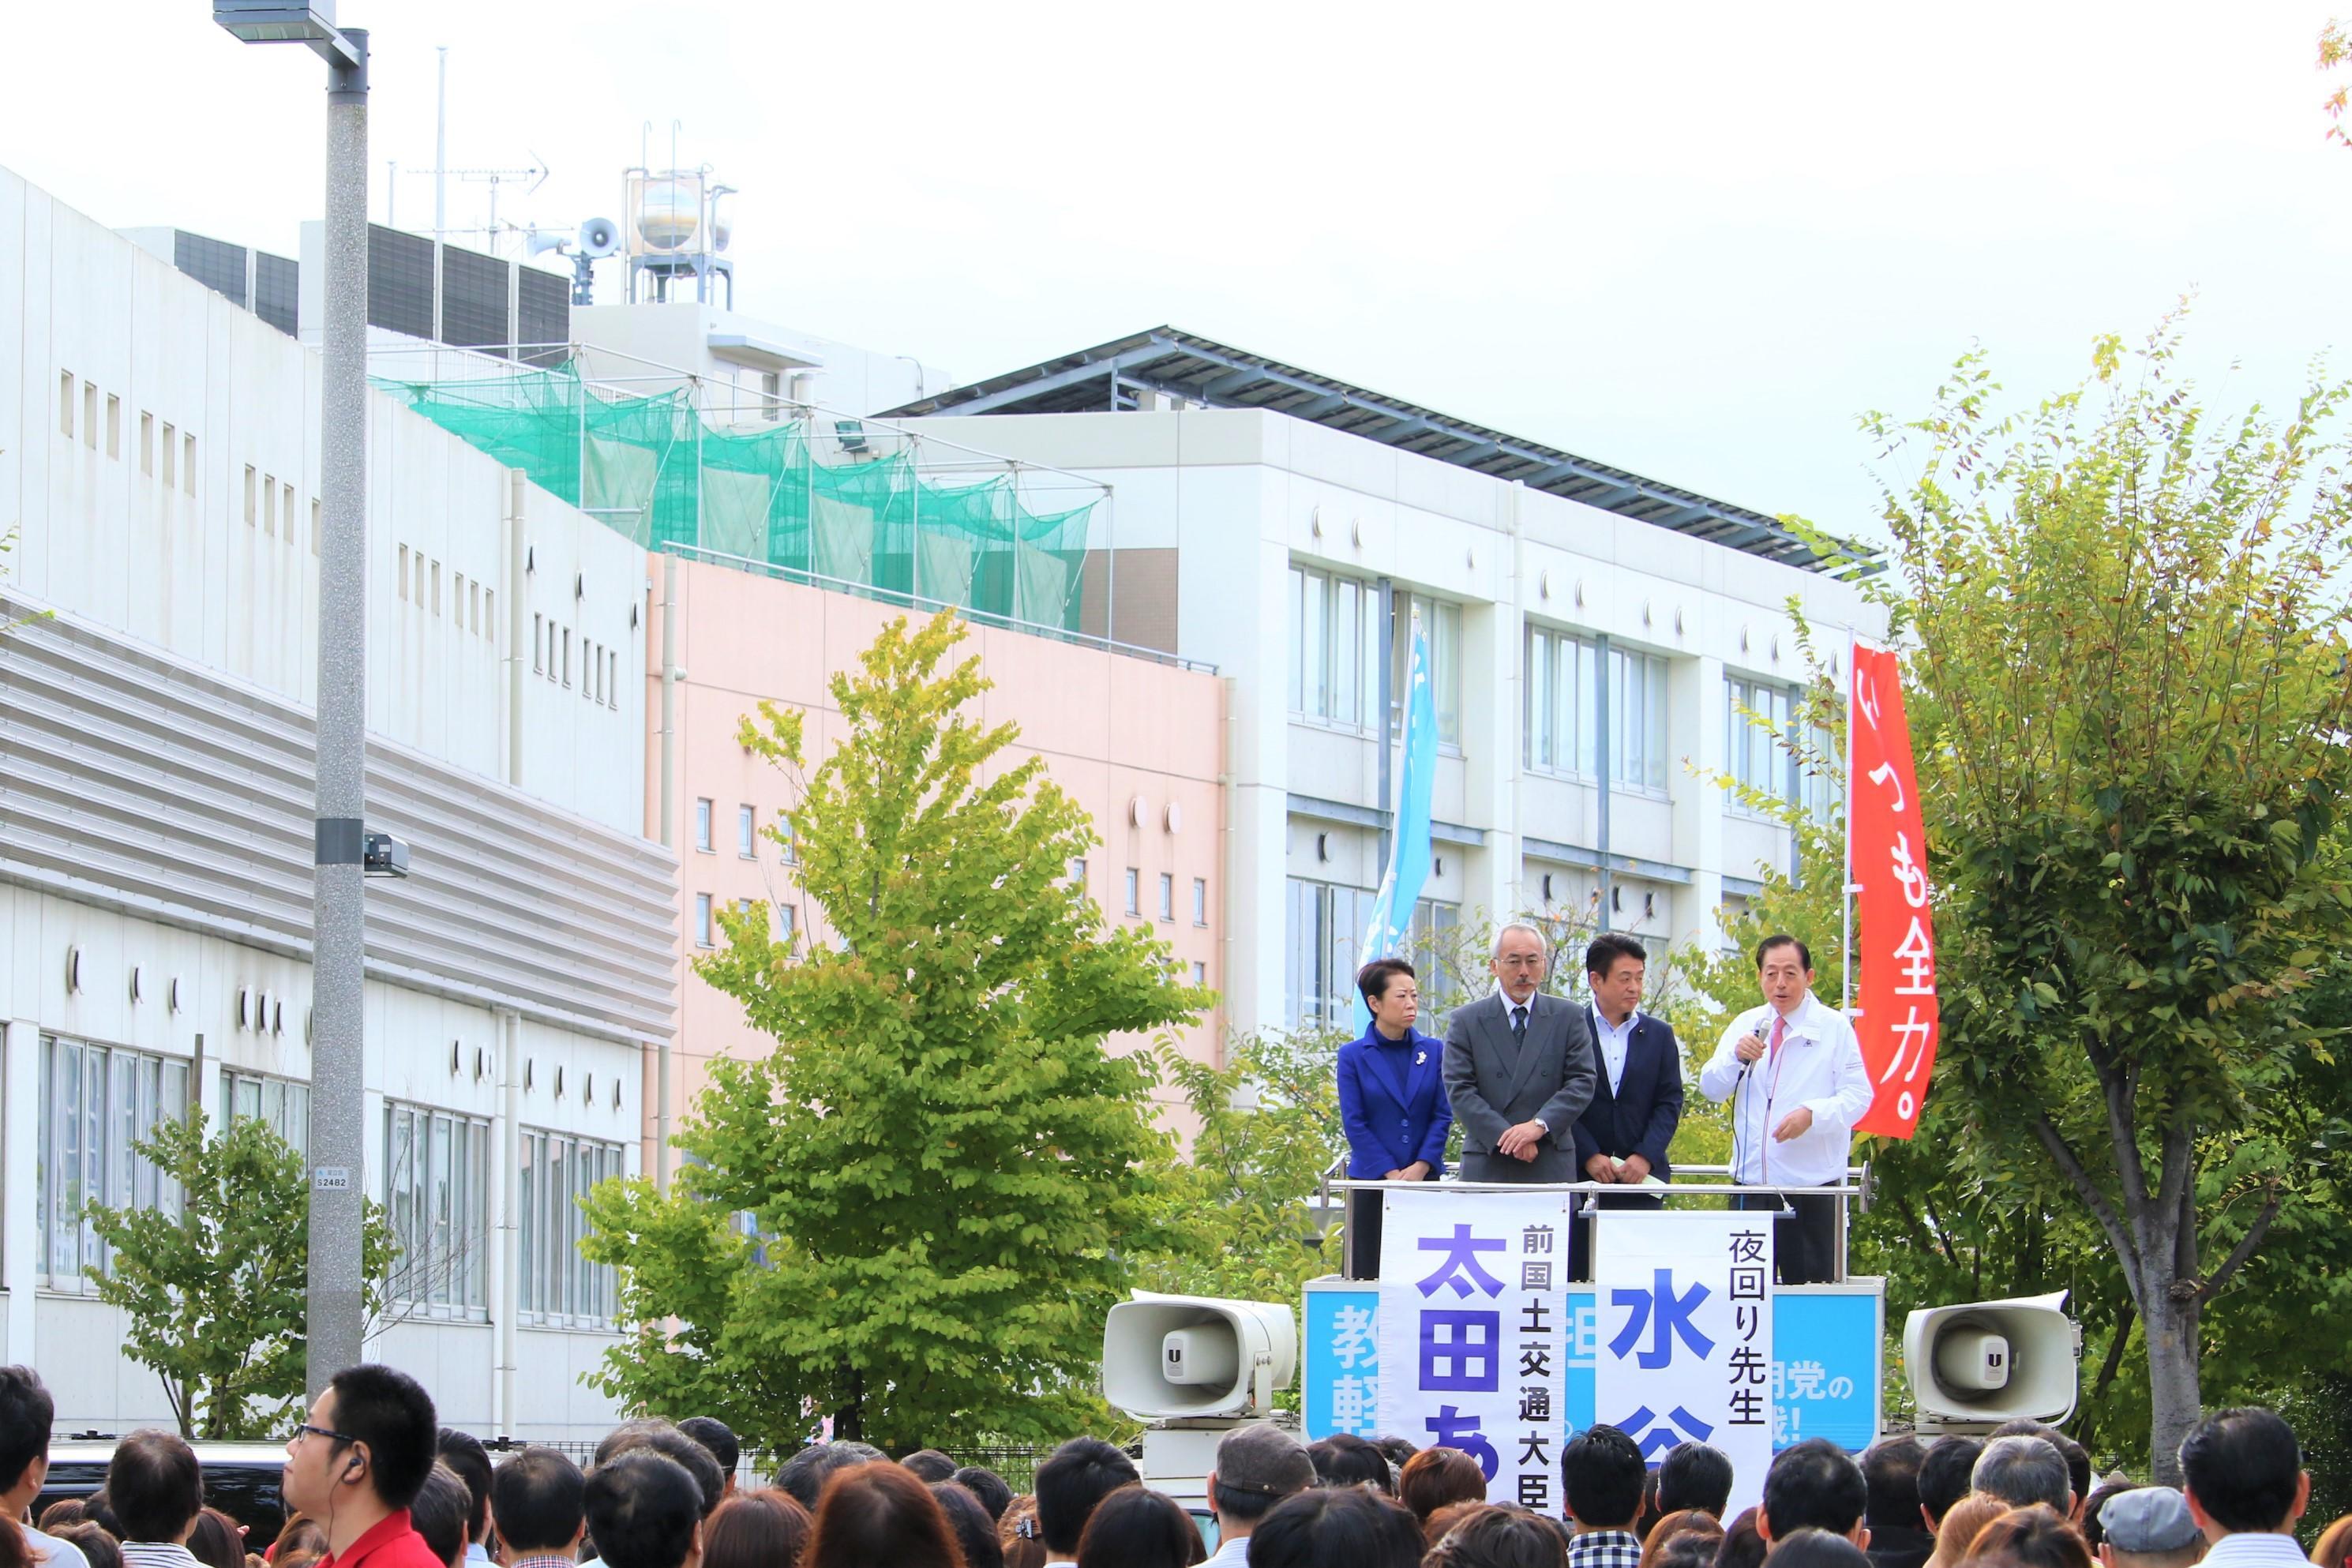 https://www.akihiro-ohta.com/blog/0A0A7274.jpg